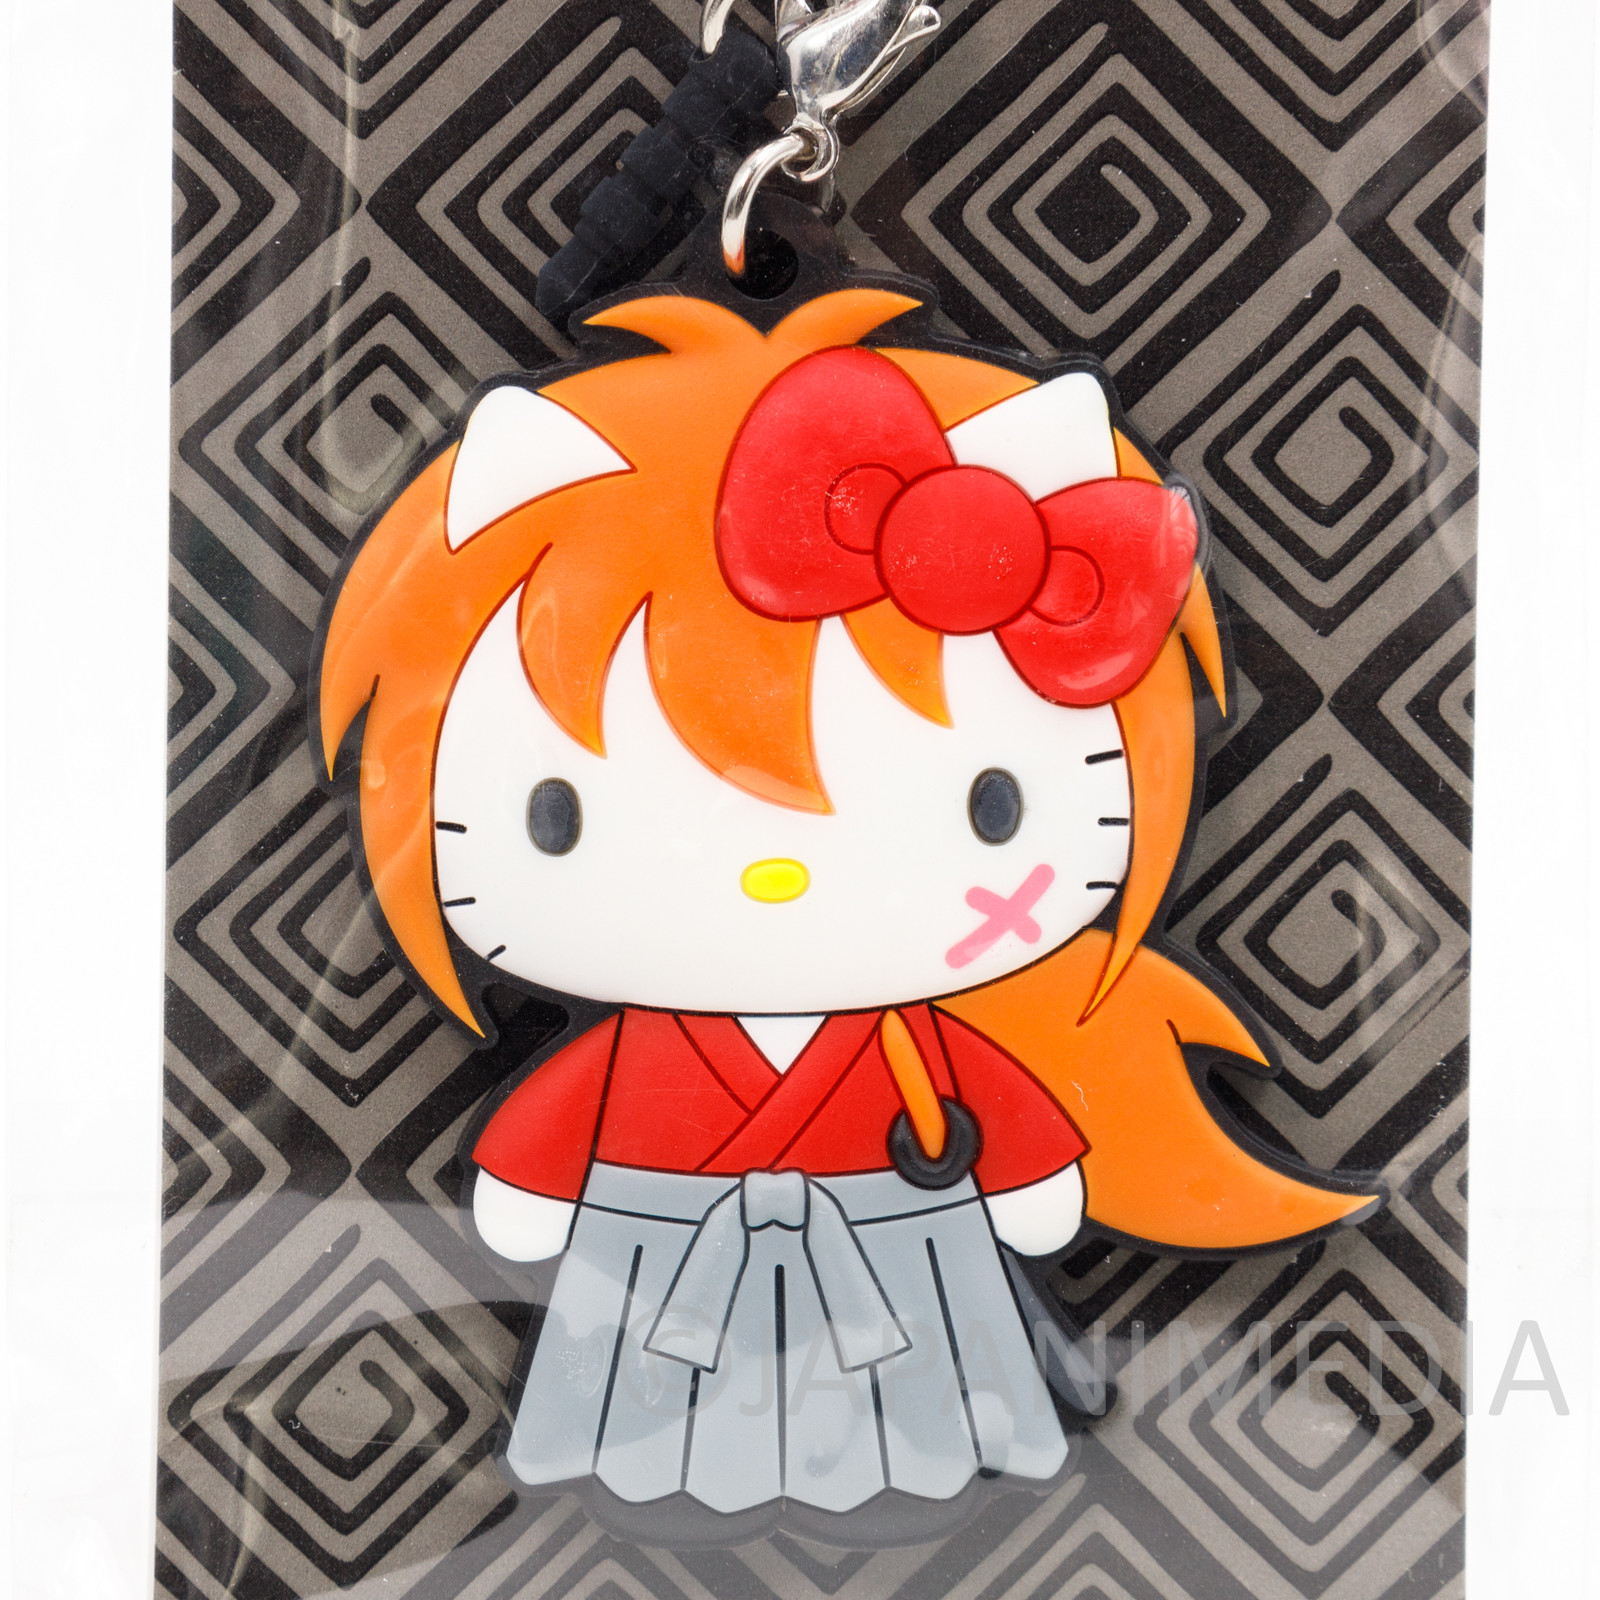 Rurouni Kenshin Himura x Hello Kitty Rubber Mascot Charm Earphone Jack Strap